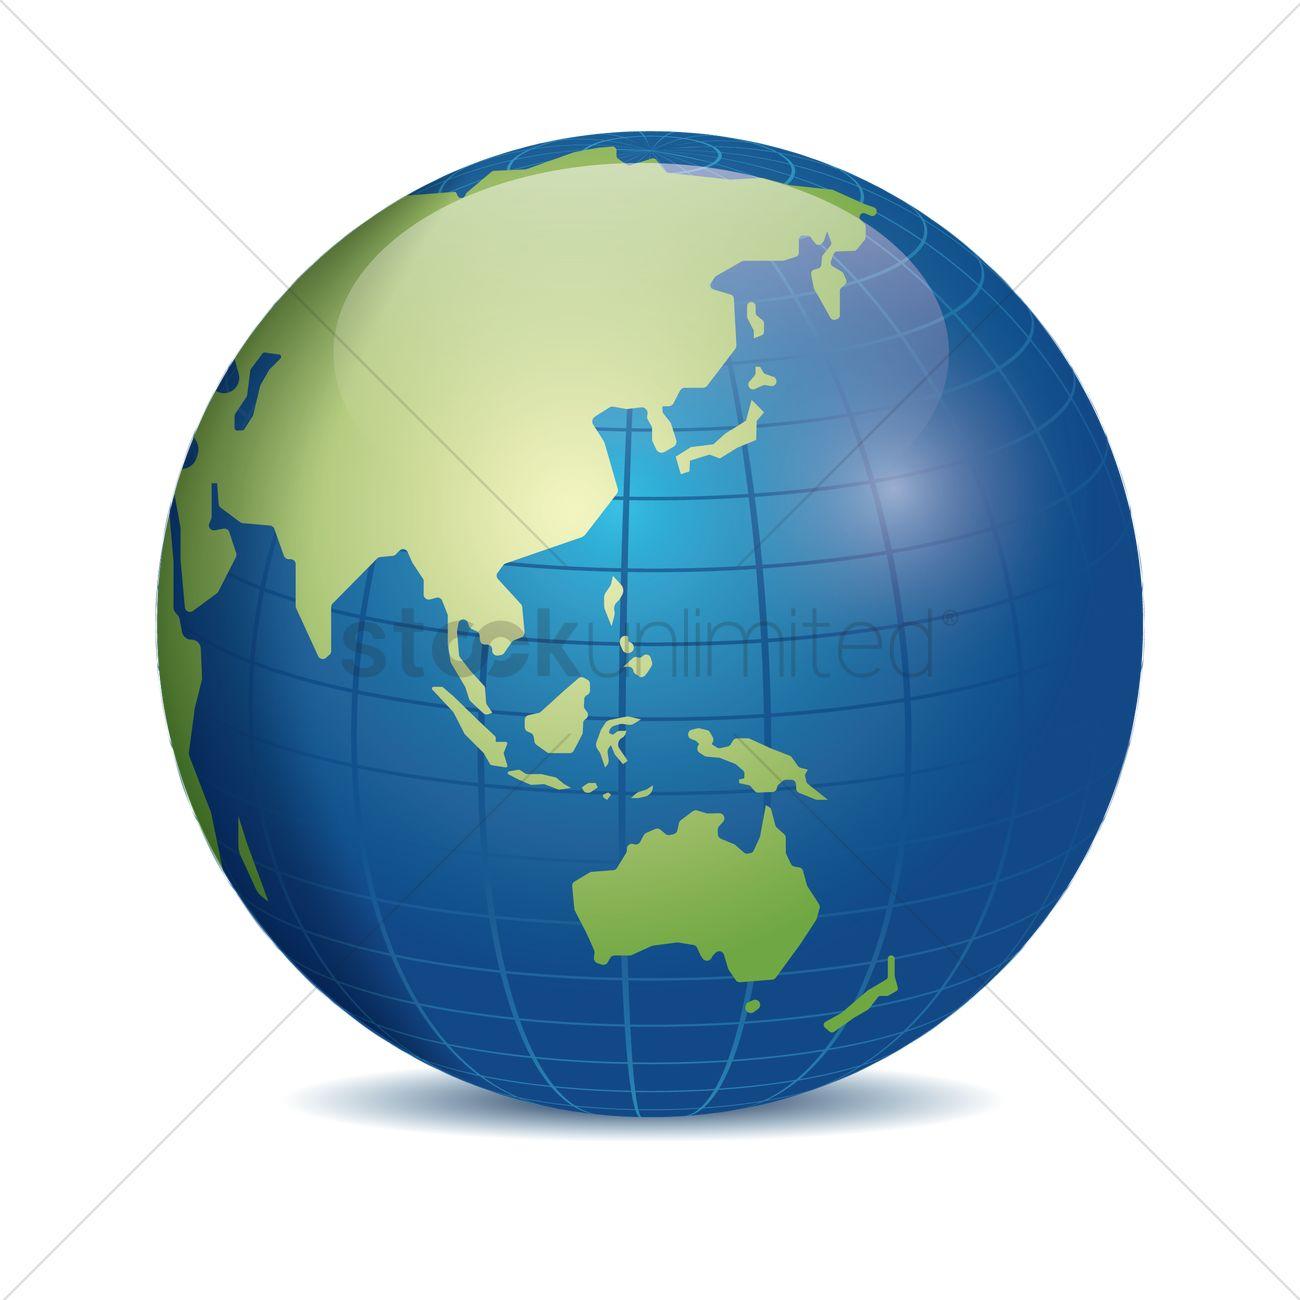 1300x1300 Icon Icons Symbol Symbols Global Worldwide International Network